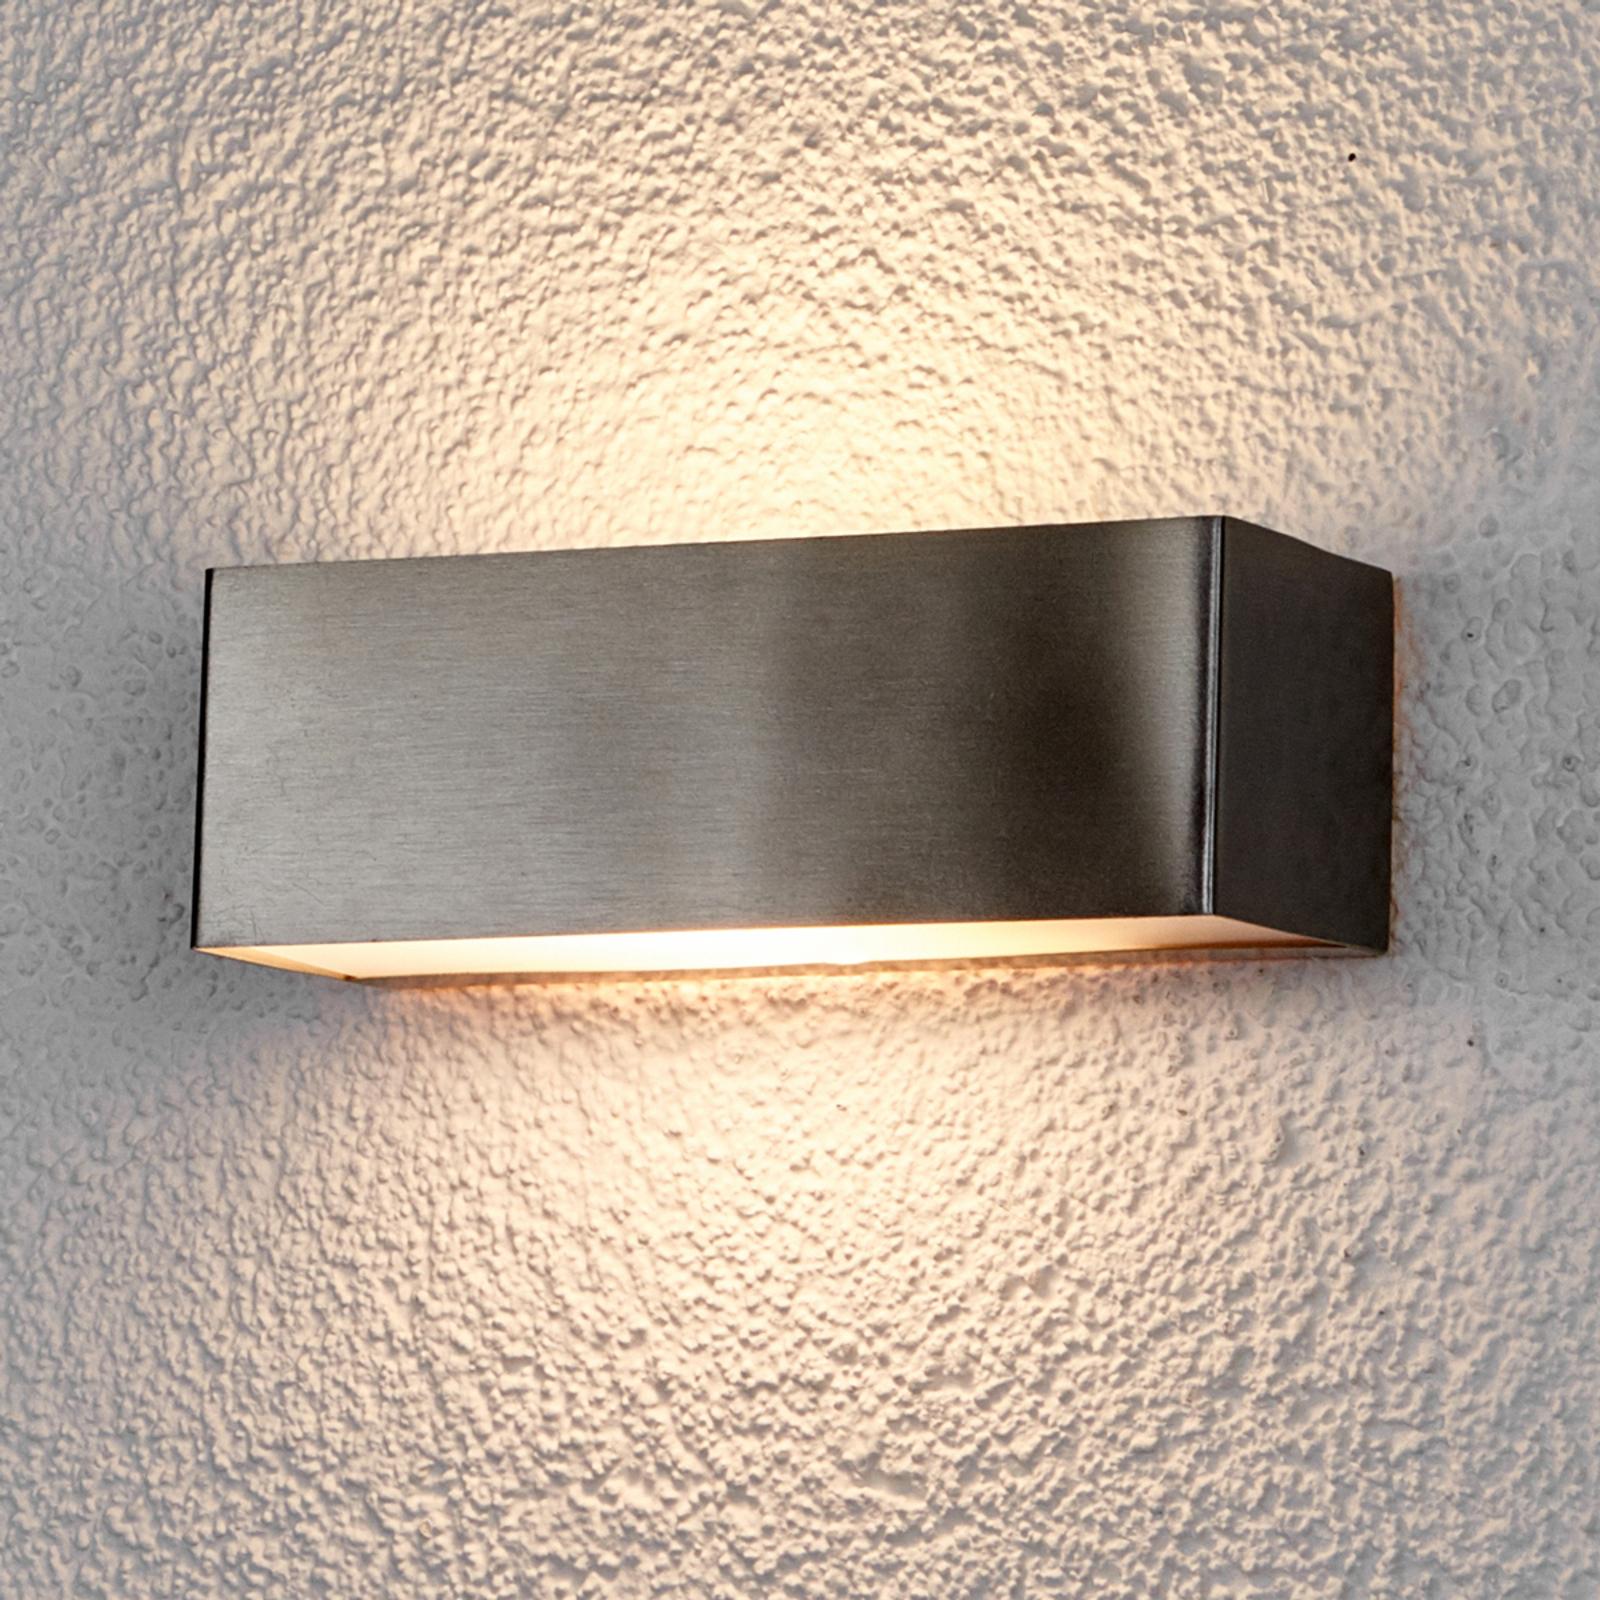 Applique LED da esterni Alicja in acciaio inox